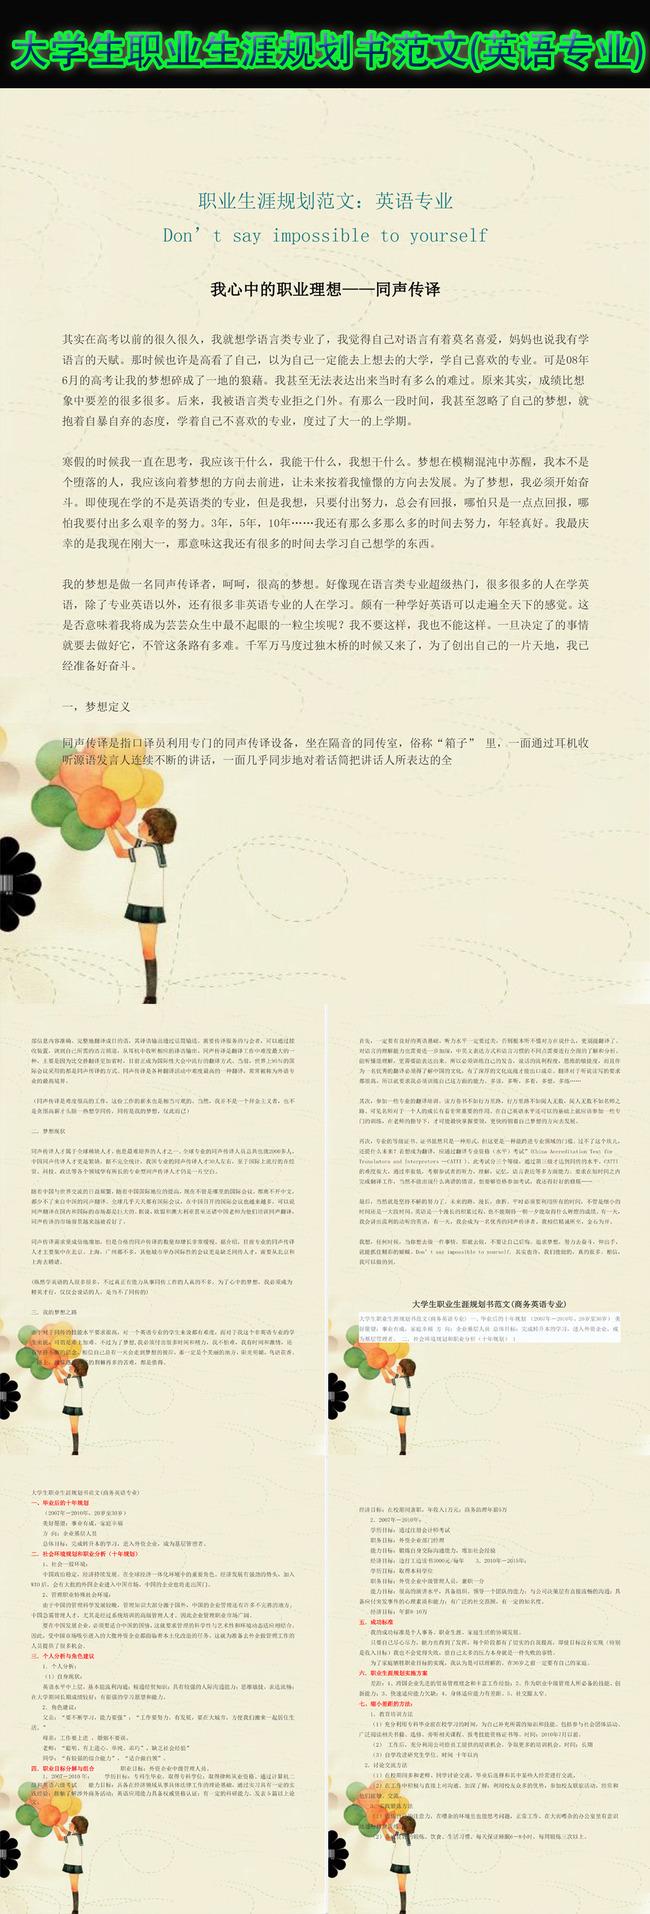 word模板 应用文书 > 大学生职业生涯规划书范文